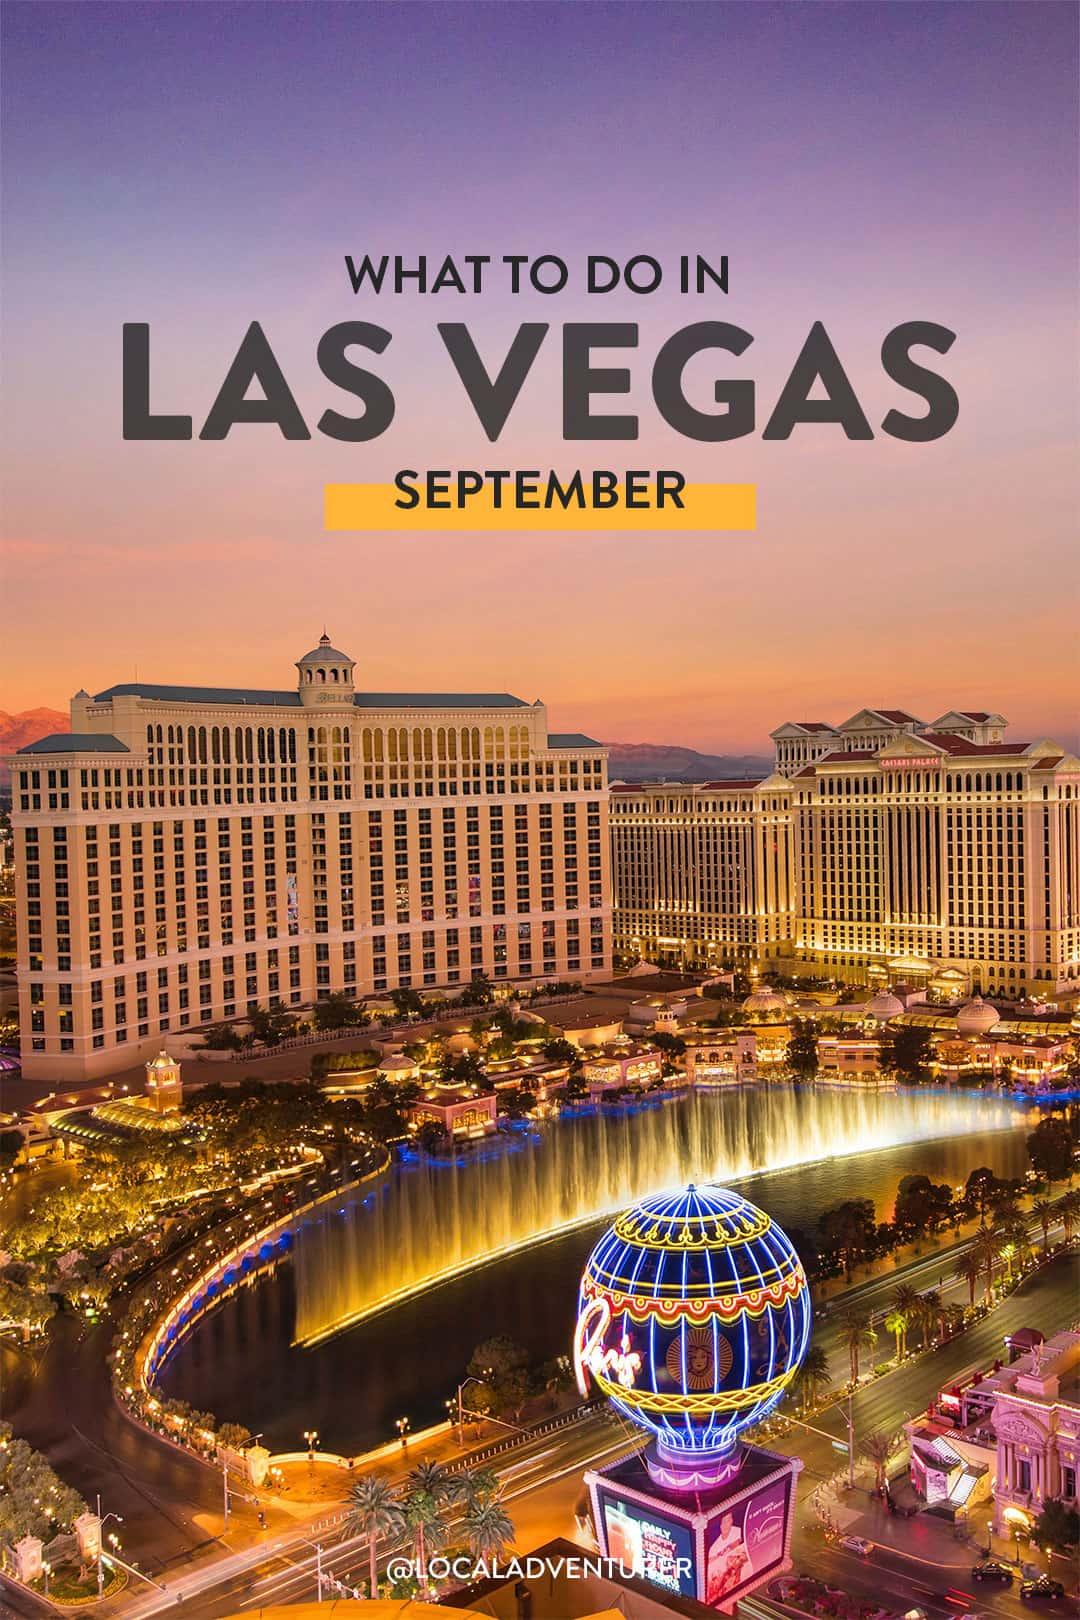 Las Vegas September Events